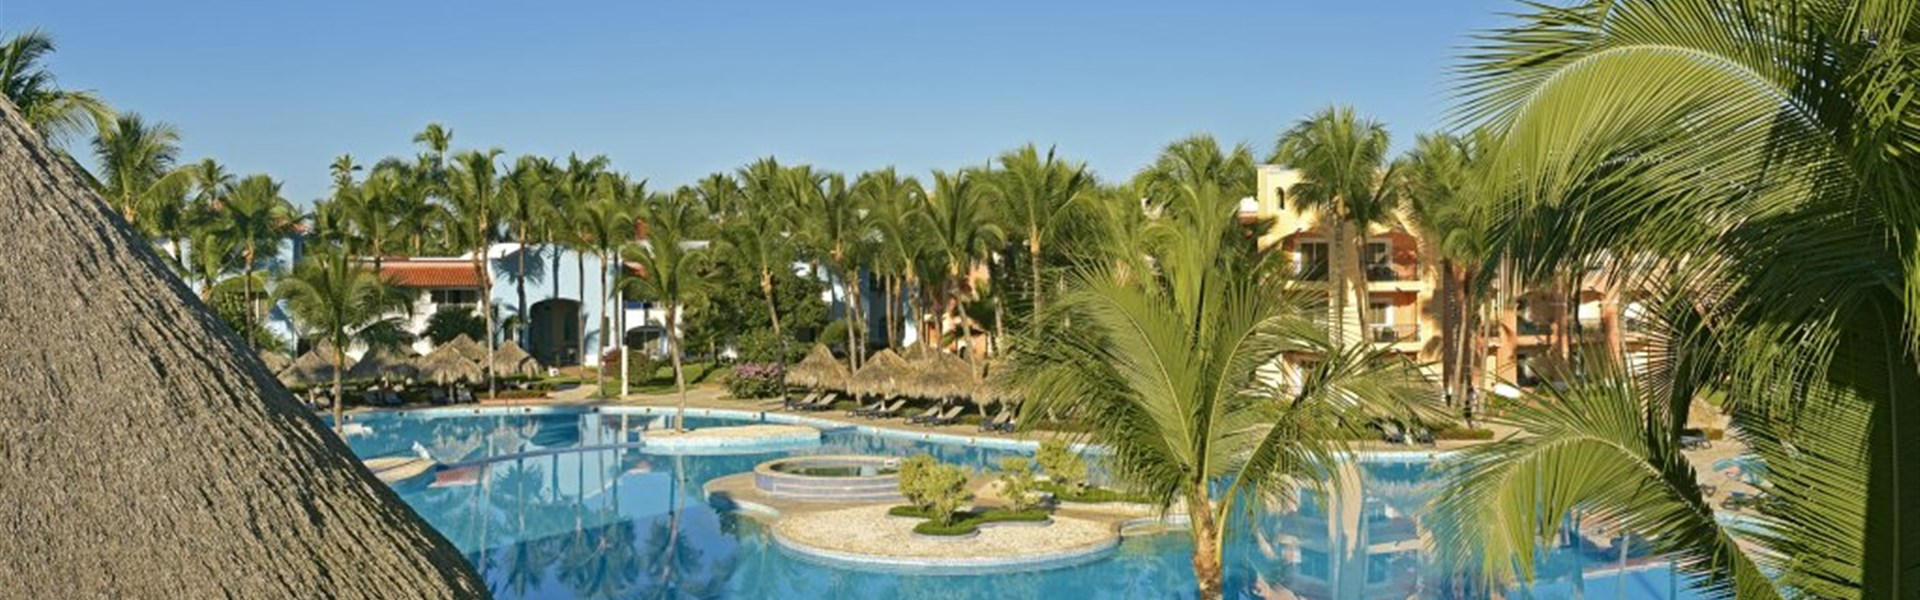 Marco Polo - Iberostar Hacienda Dominicus Bayahibe (5*) -